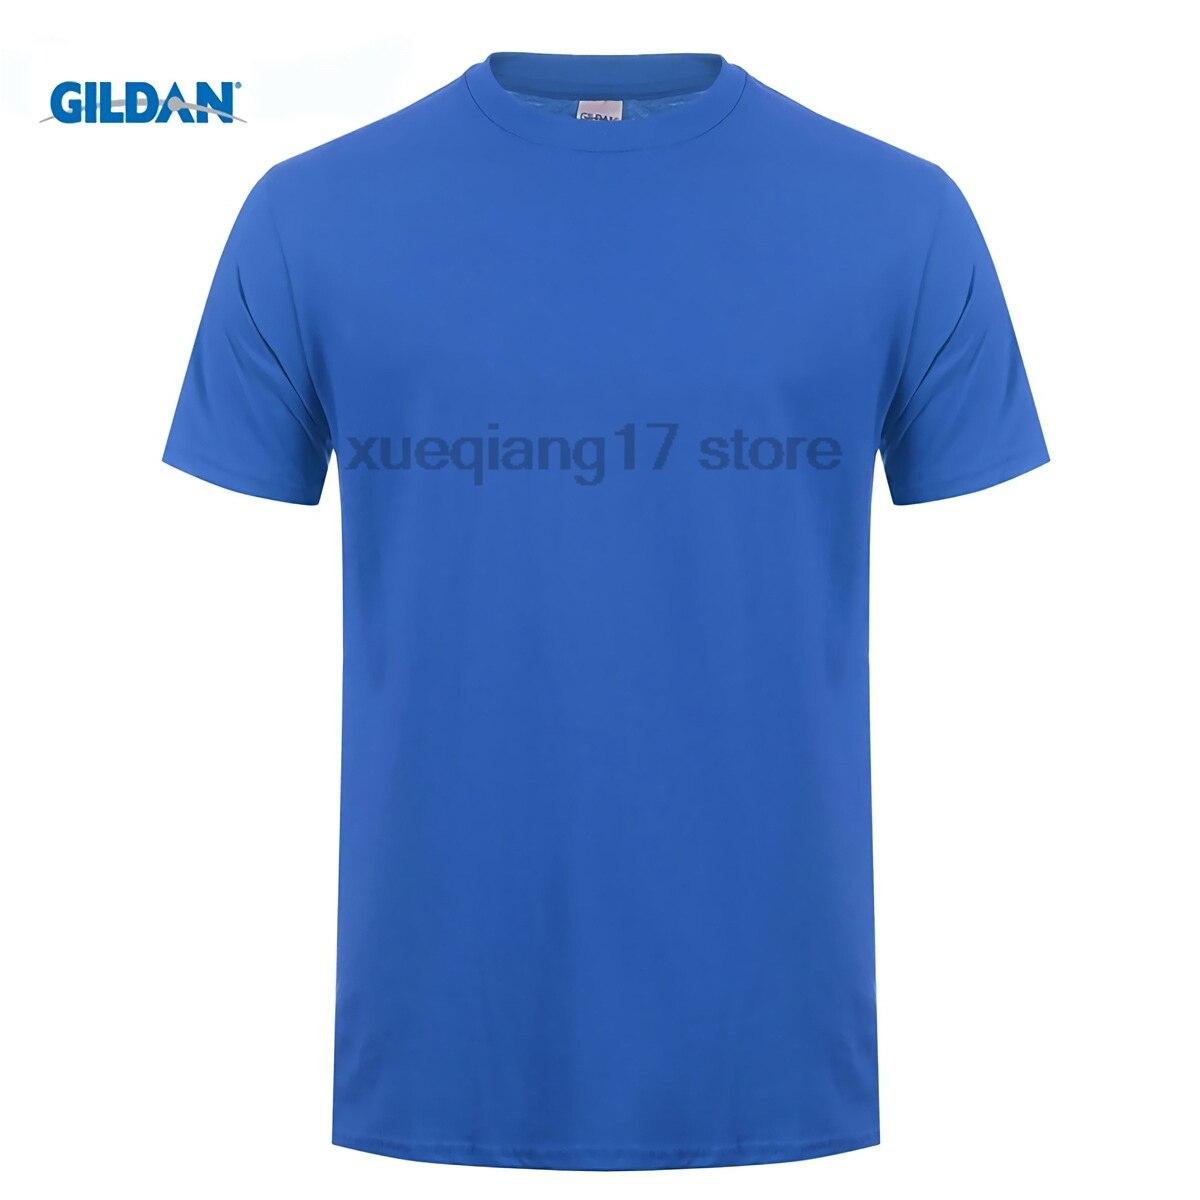 Hurley Calibrate Short Sleeve T-Shirt in Sail